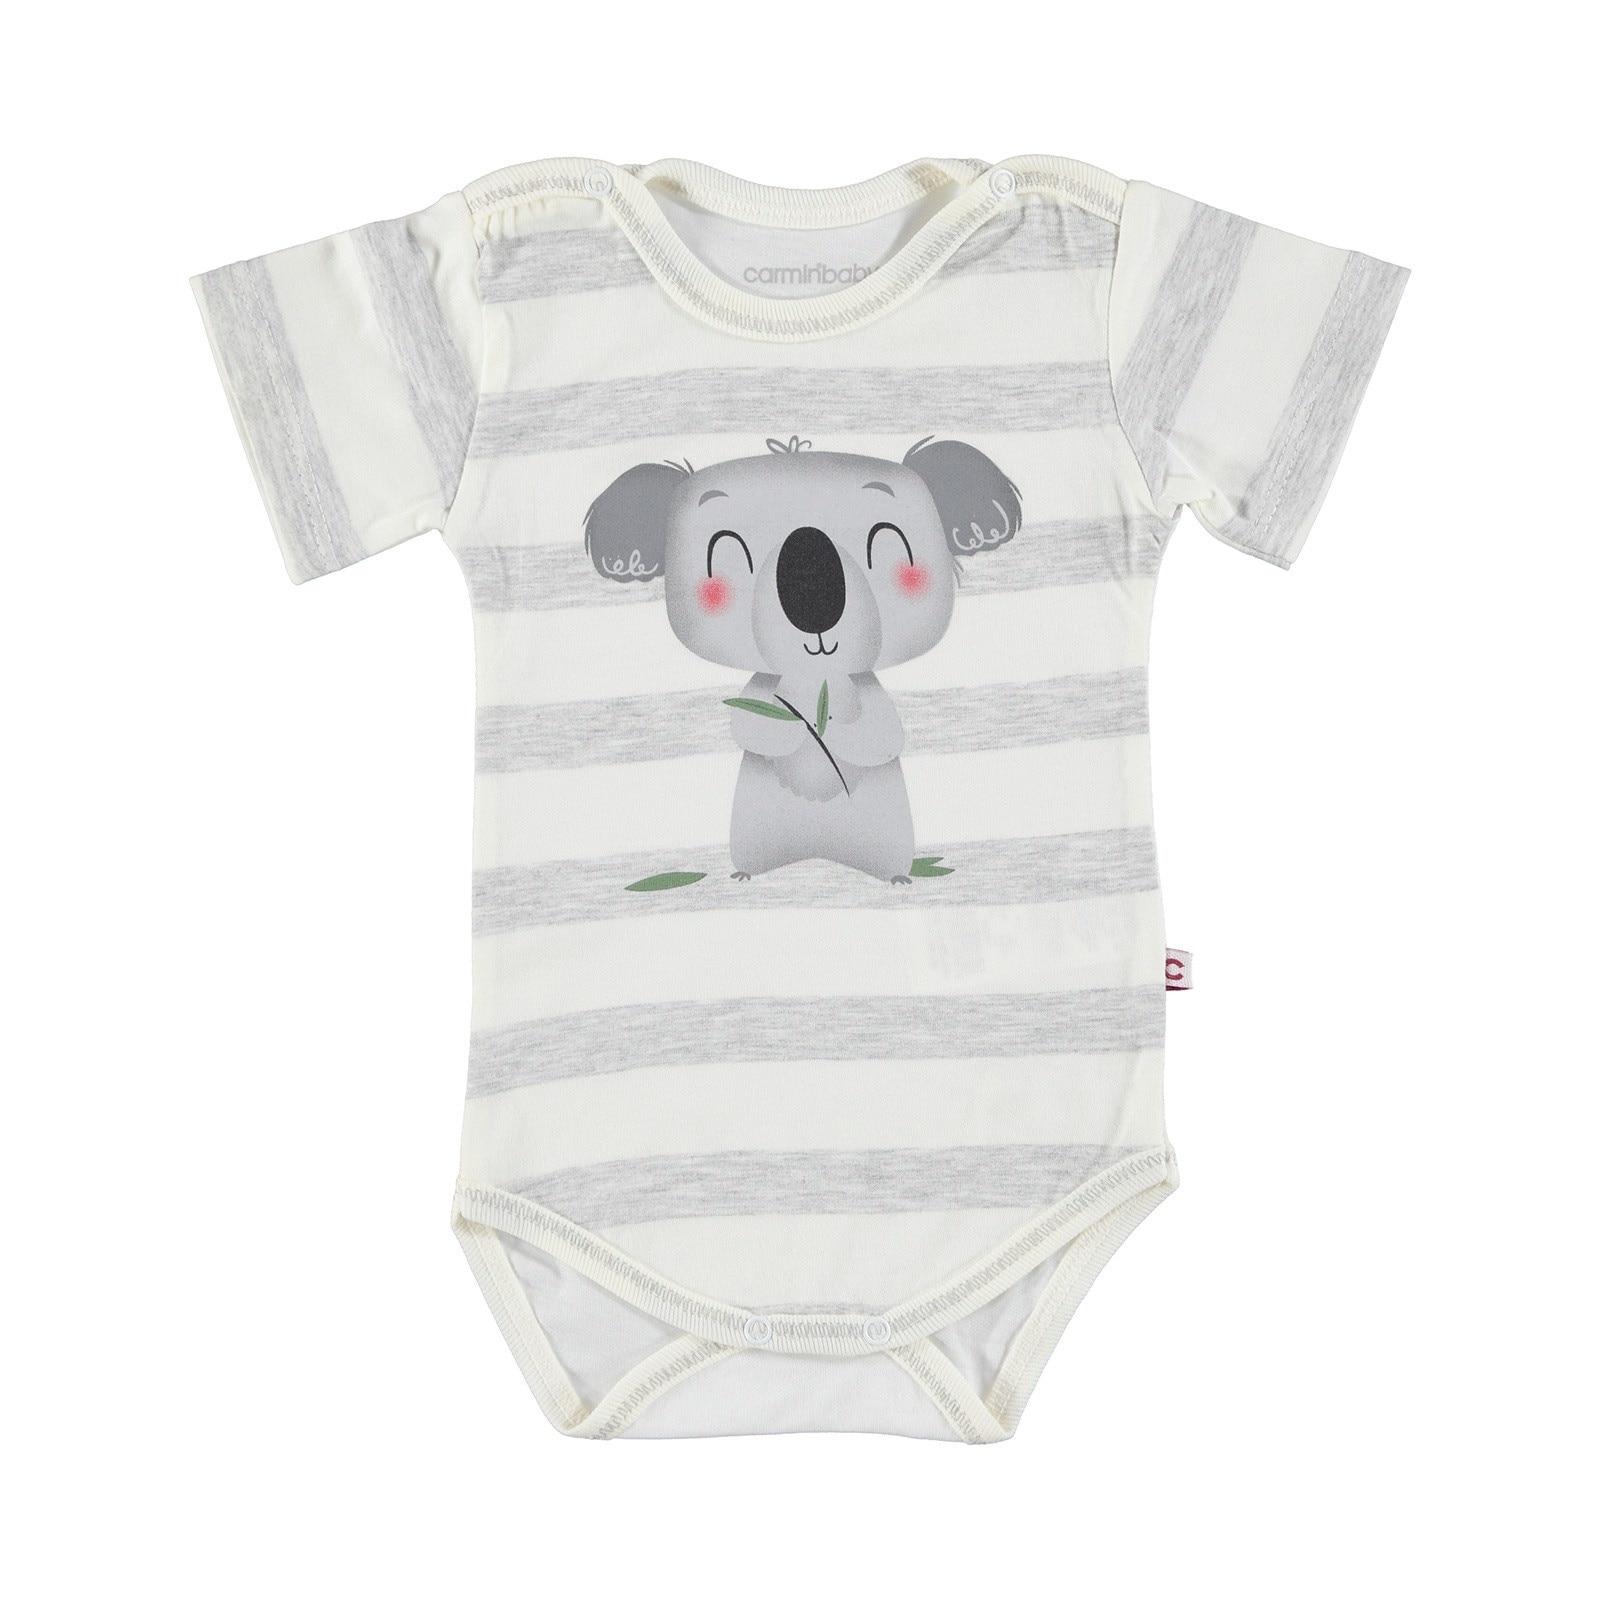 Ebebek Carmin Baby Boy Koala Printed Short Sleeve Bodysuit